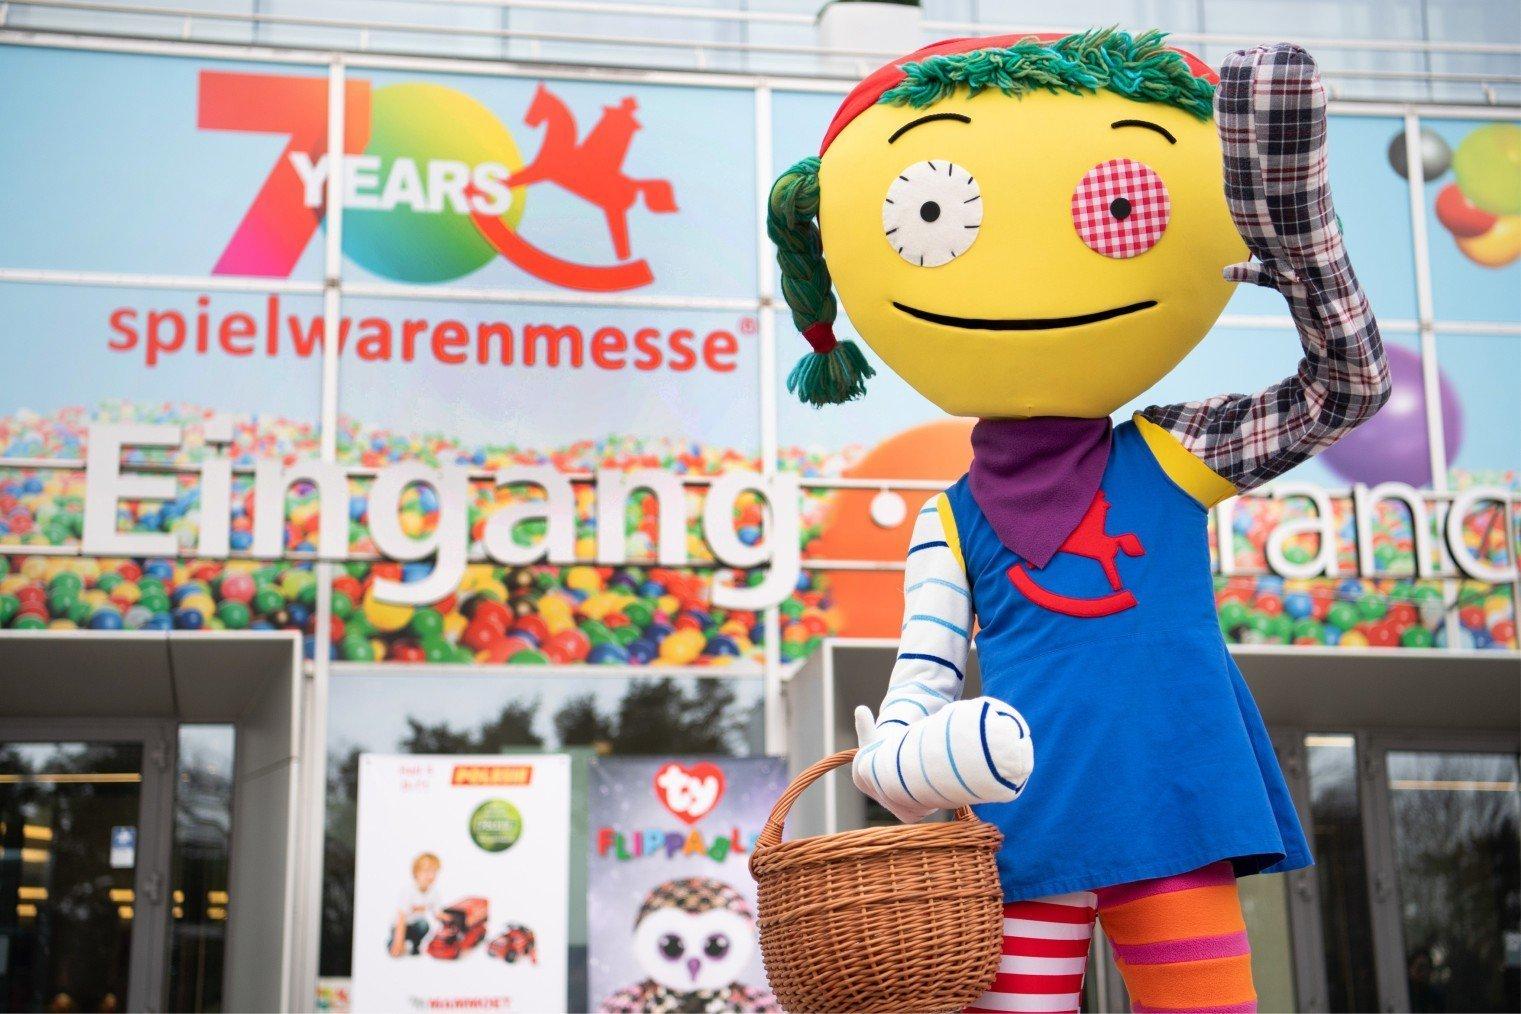 Nuremberg International Toy Fair, Germany